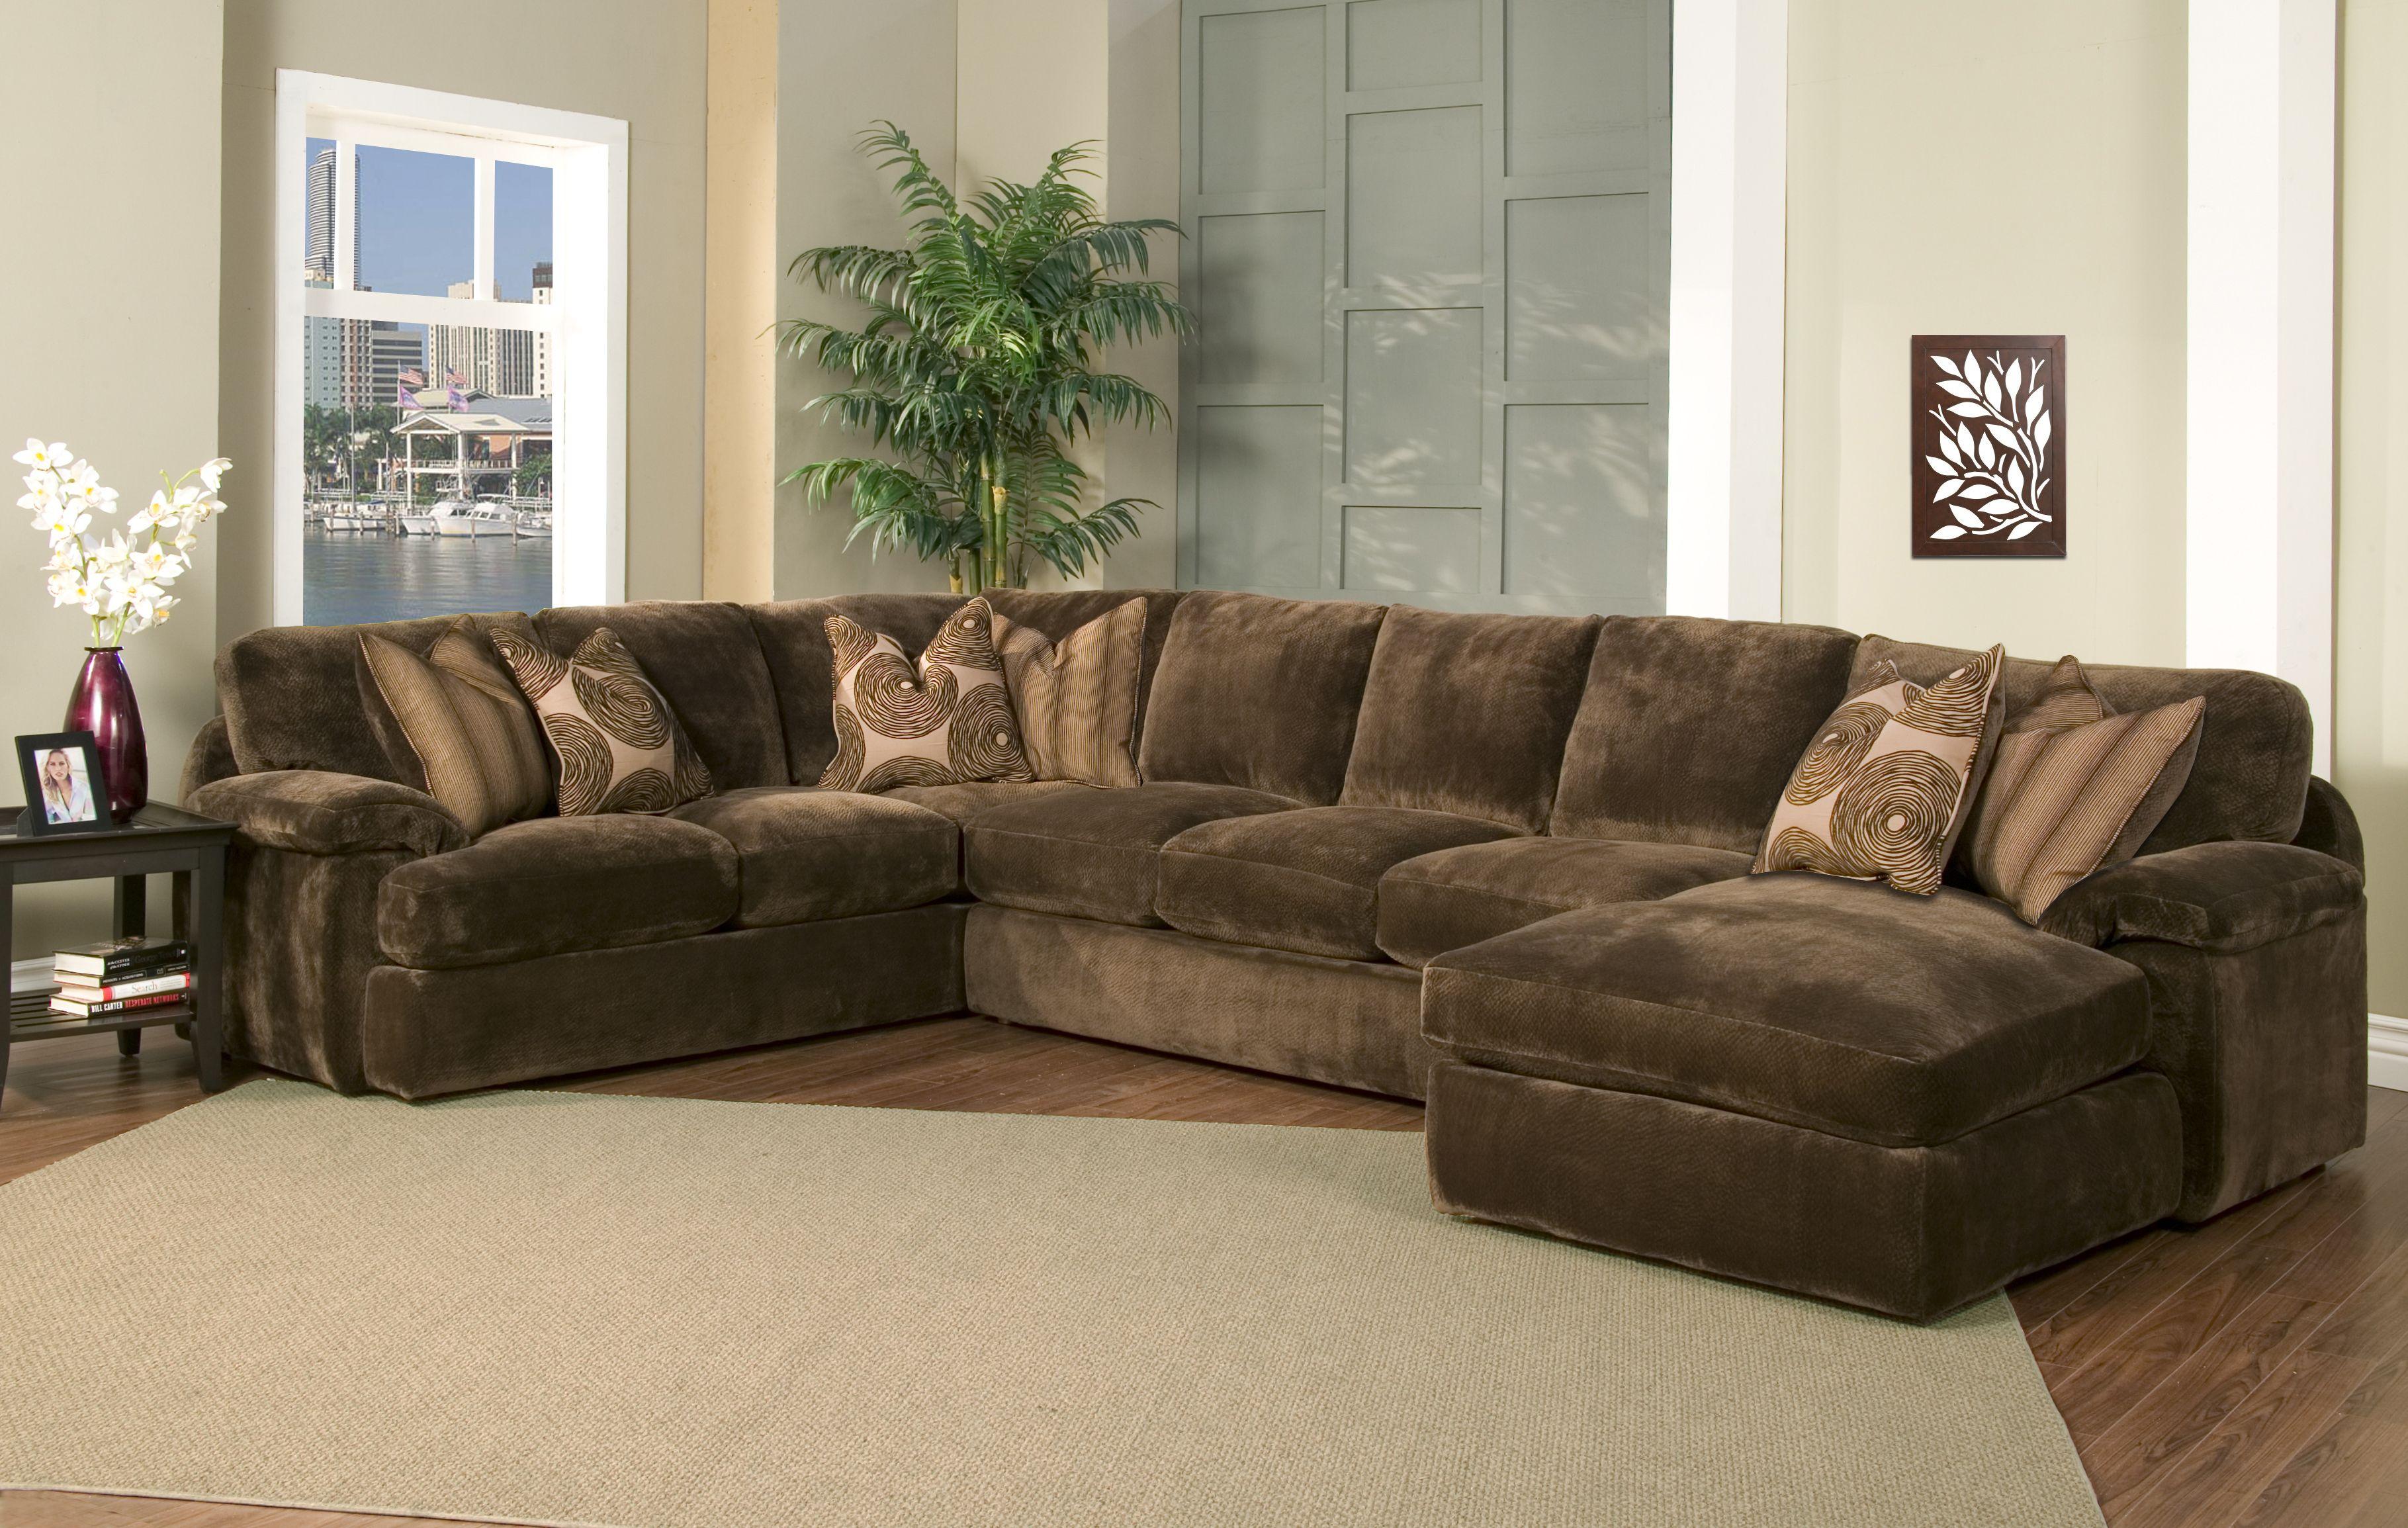 Corduroy Couch Deep Sectional Sofas Sleeper Fabric Cushions